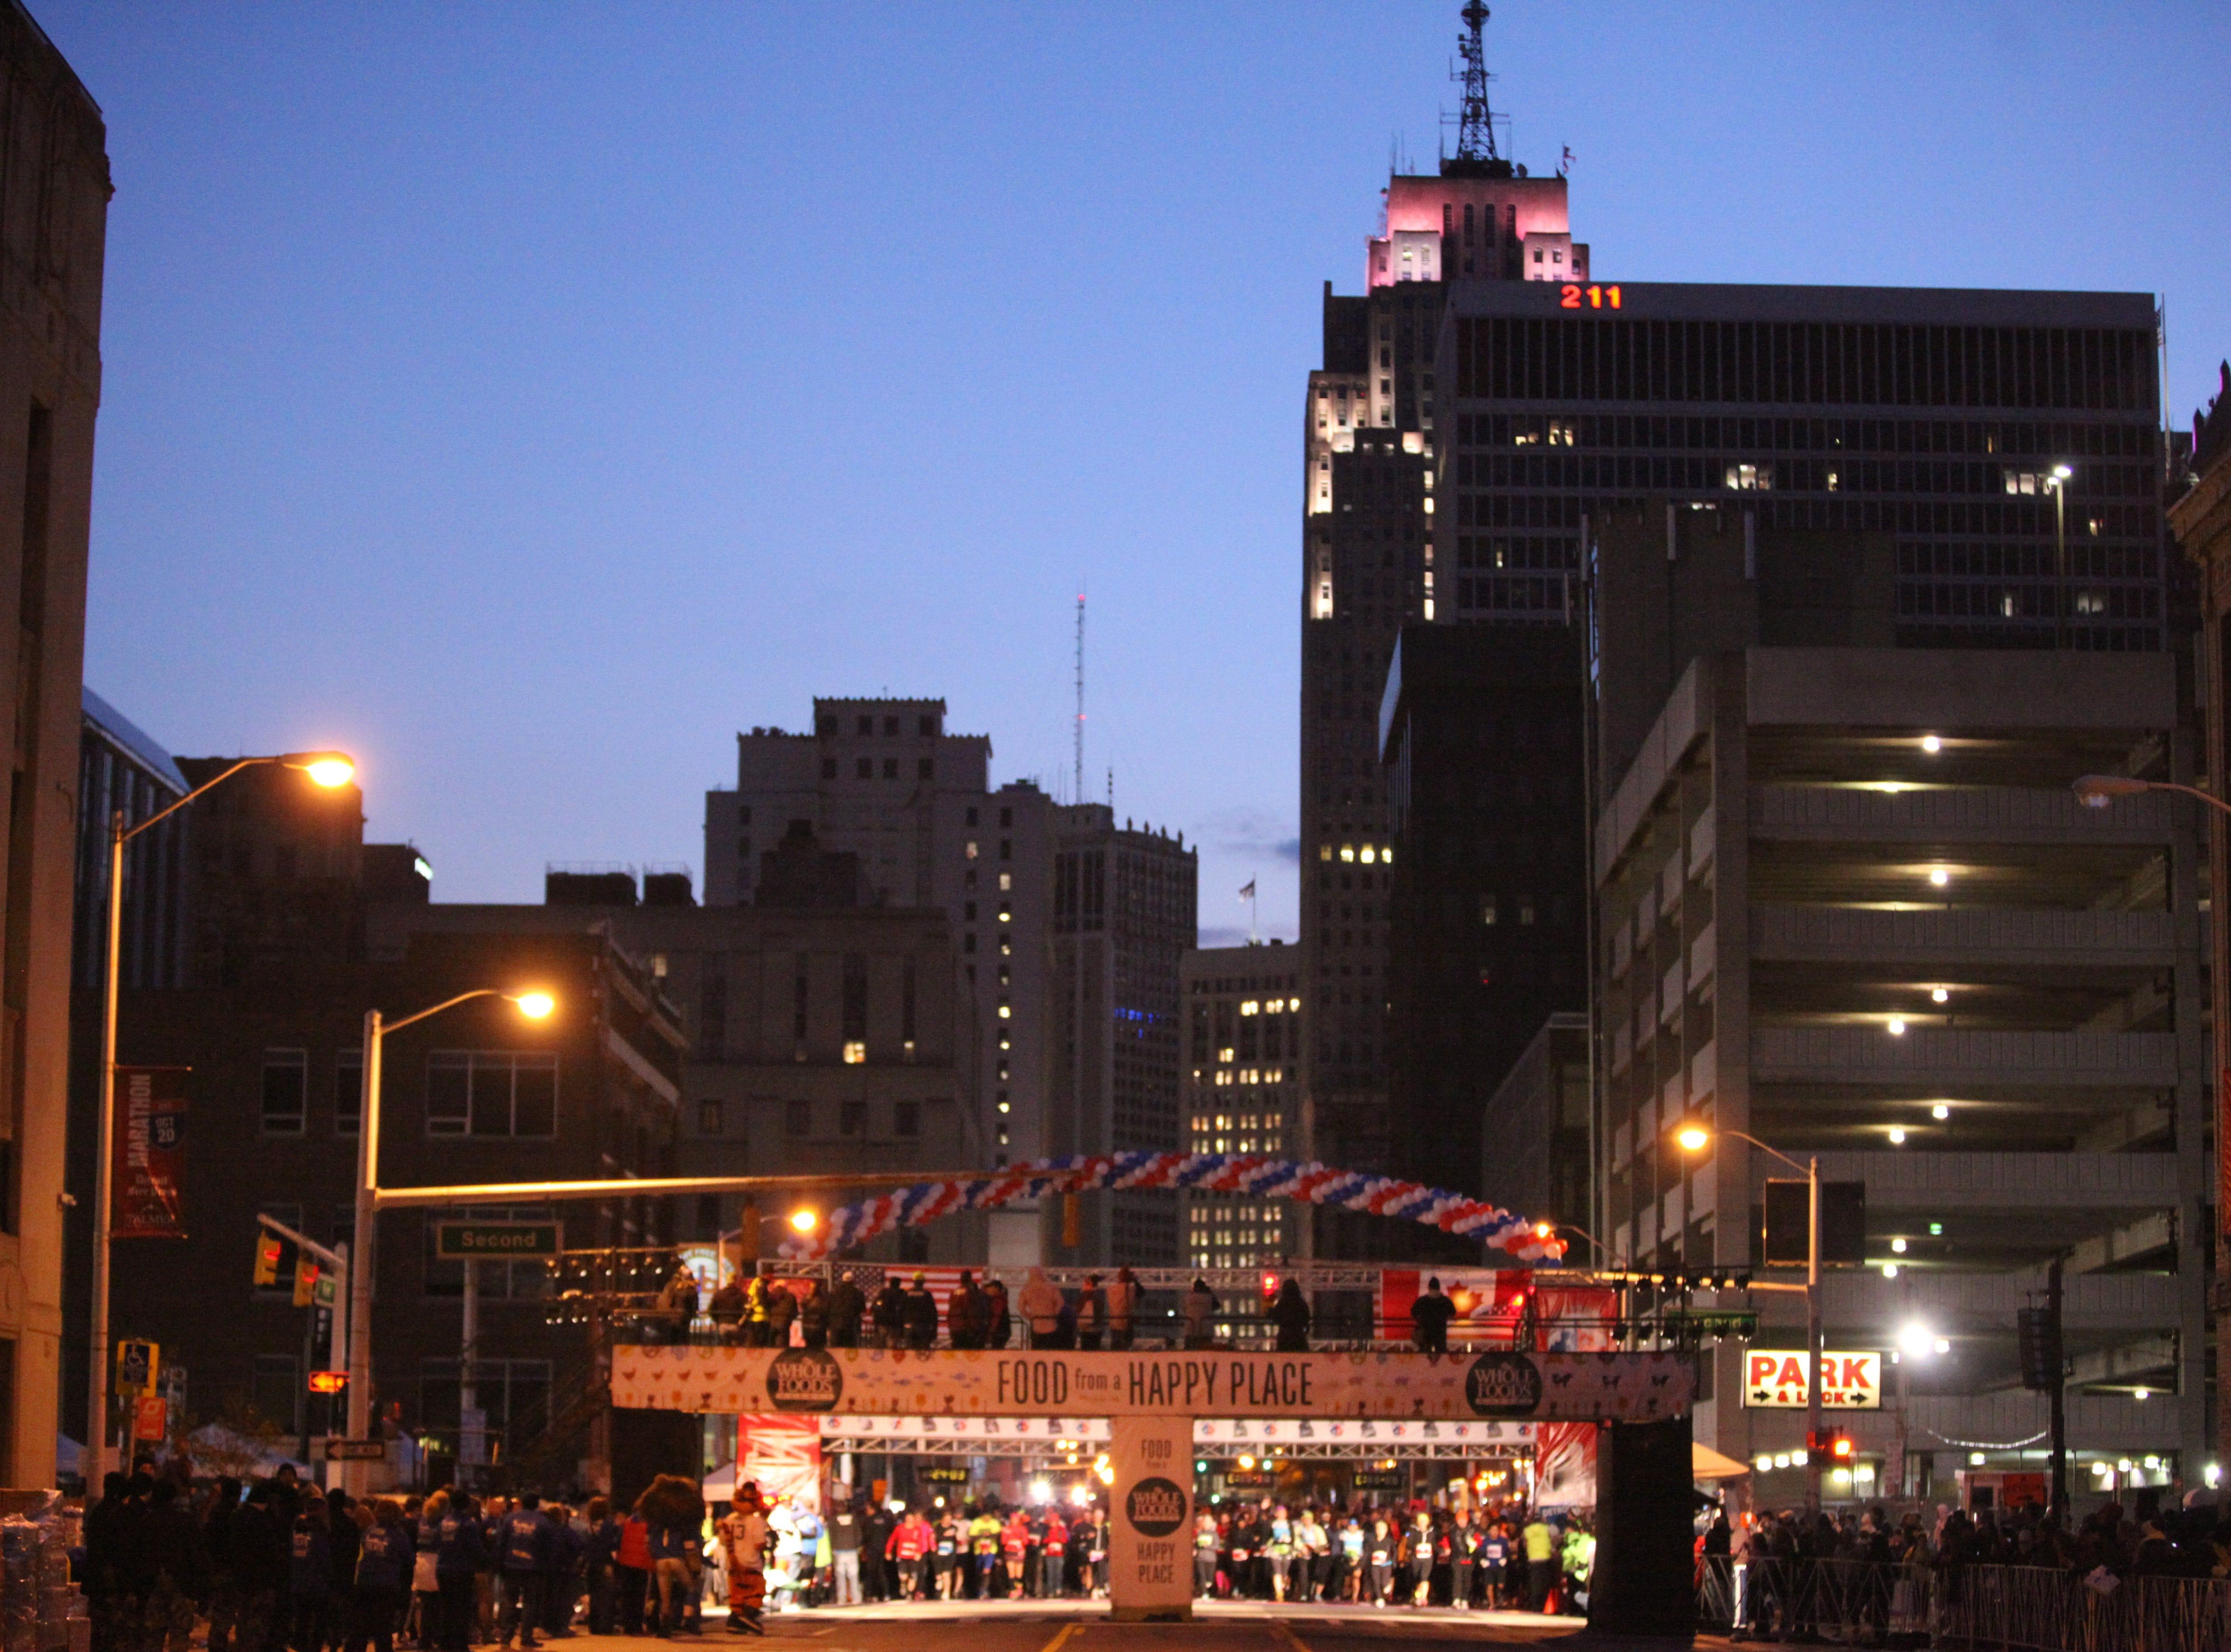 Start of the 36th Annual Detroit Free Press/Talmer Bank Marathon in Detroit Sunday, Oct. 20, 2013.